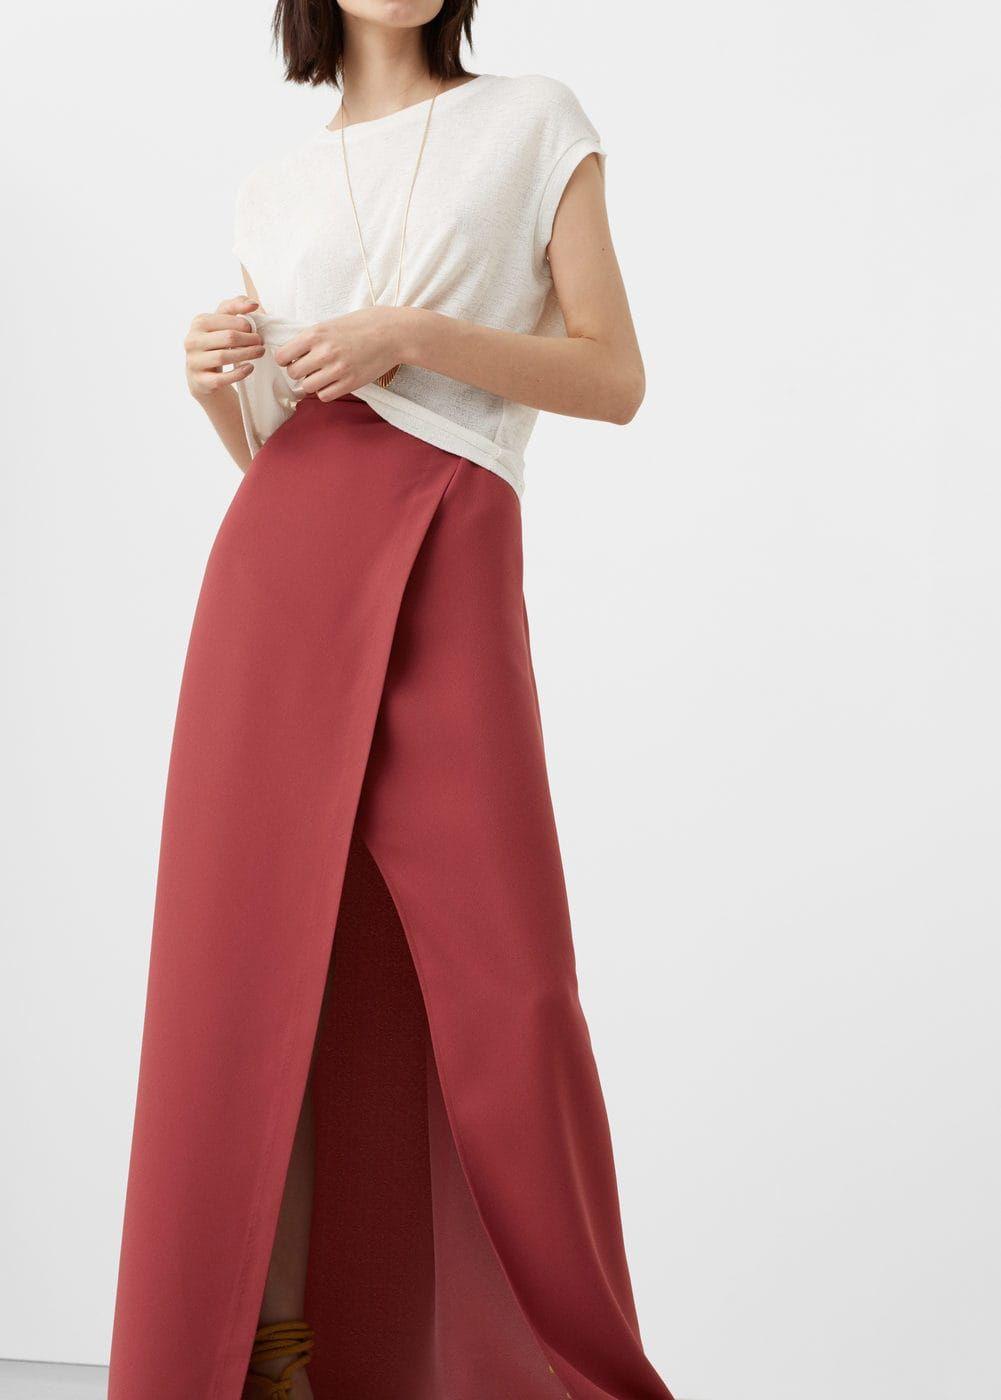 Fashion week Long stylish skirts online for girls